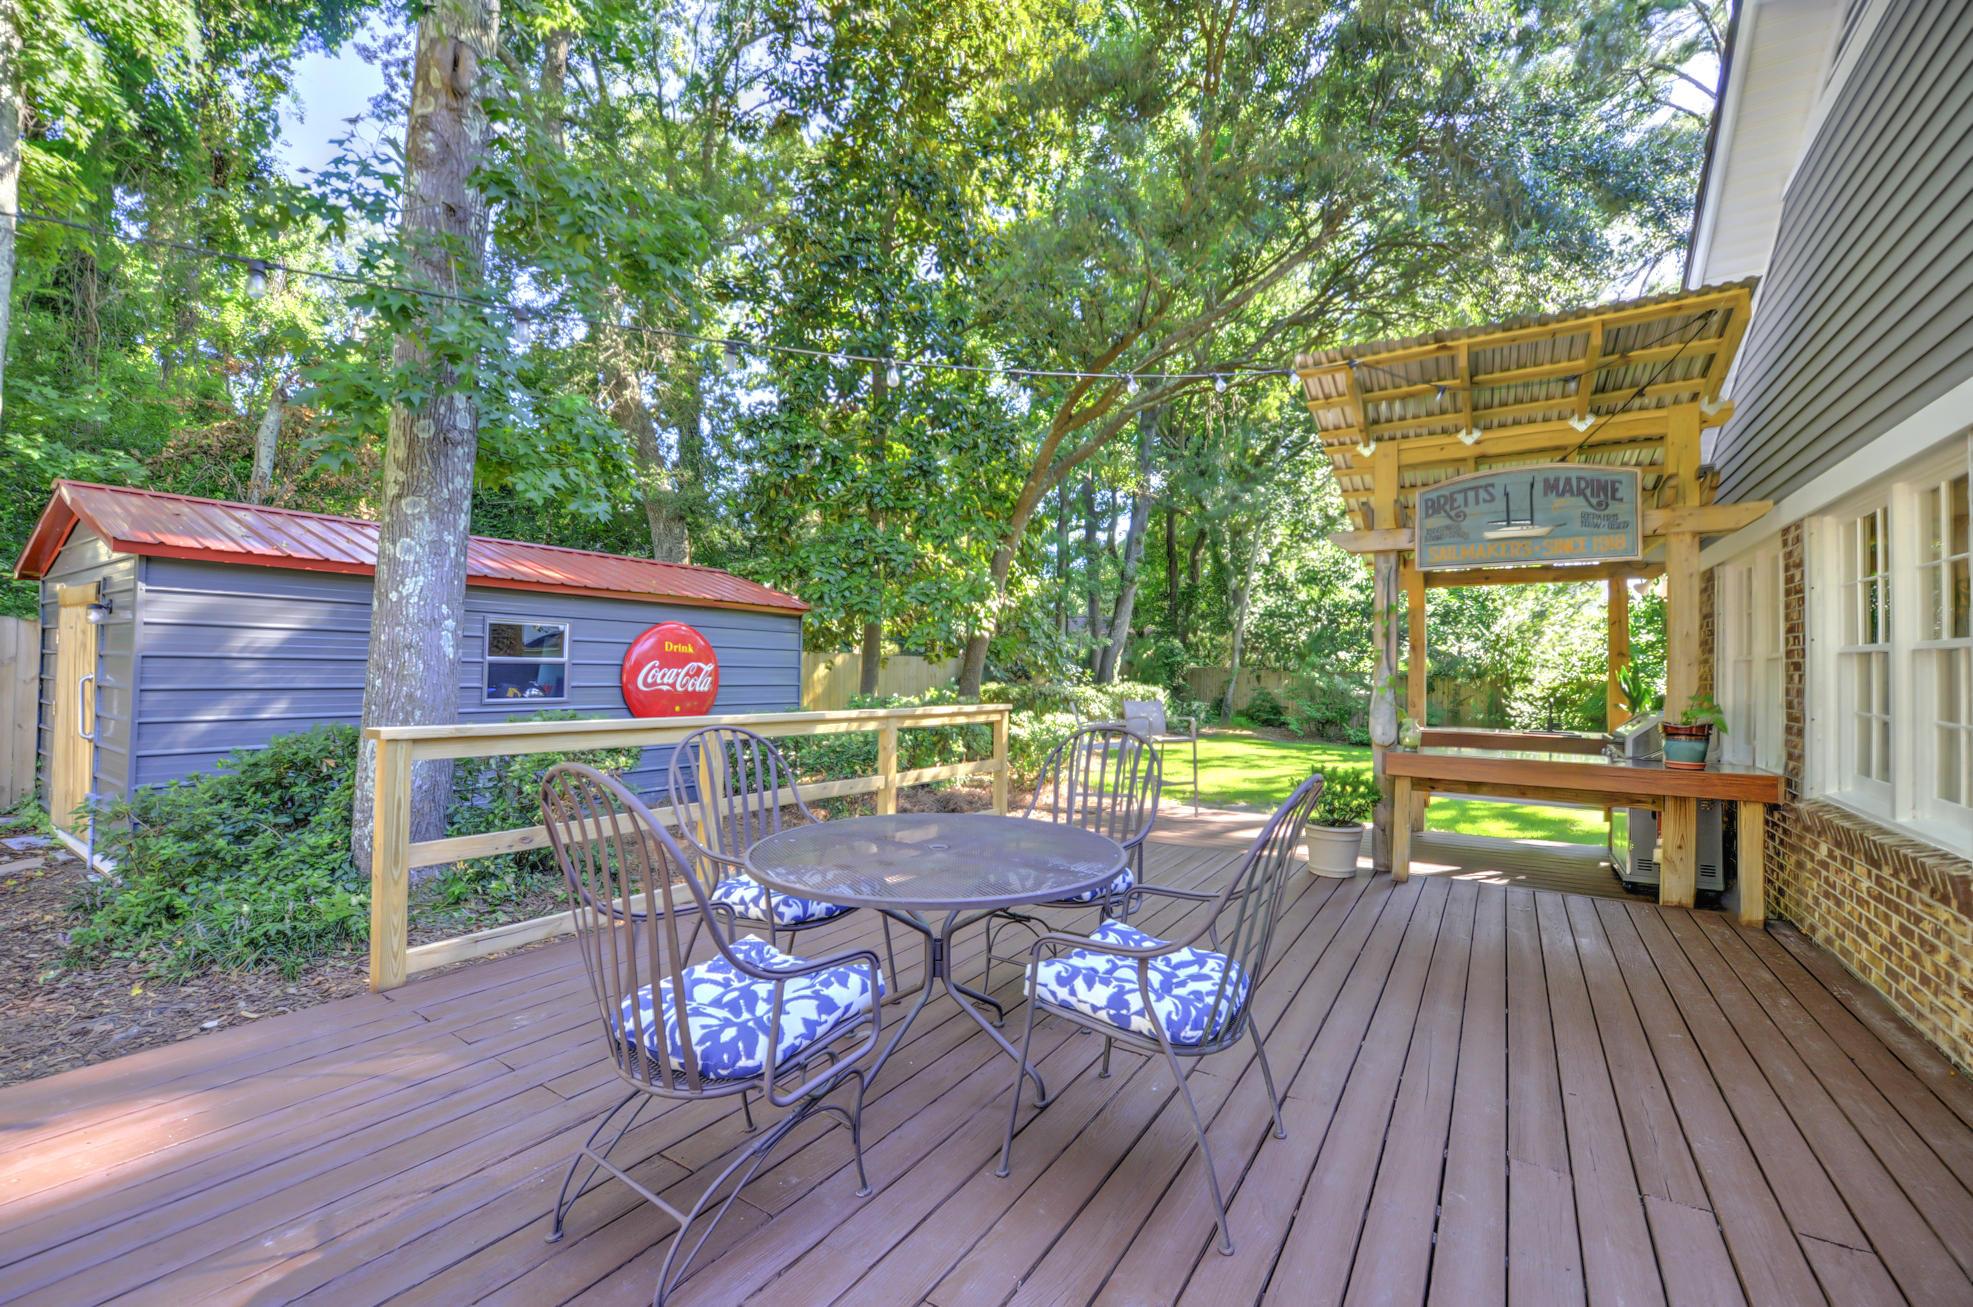 Shemwood II Homes For Sale - 1017 Jack Snipe, Mount Pleasant, SC - 46